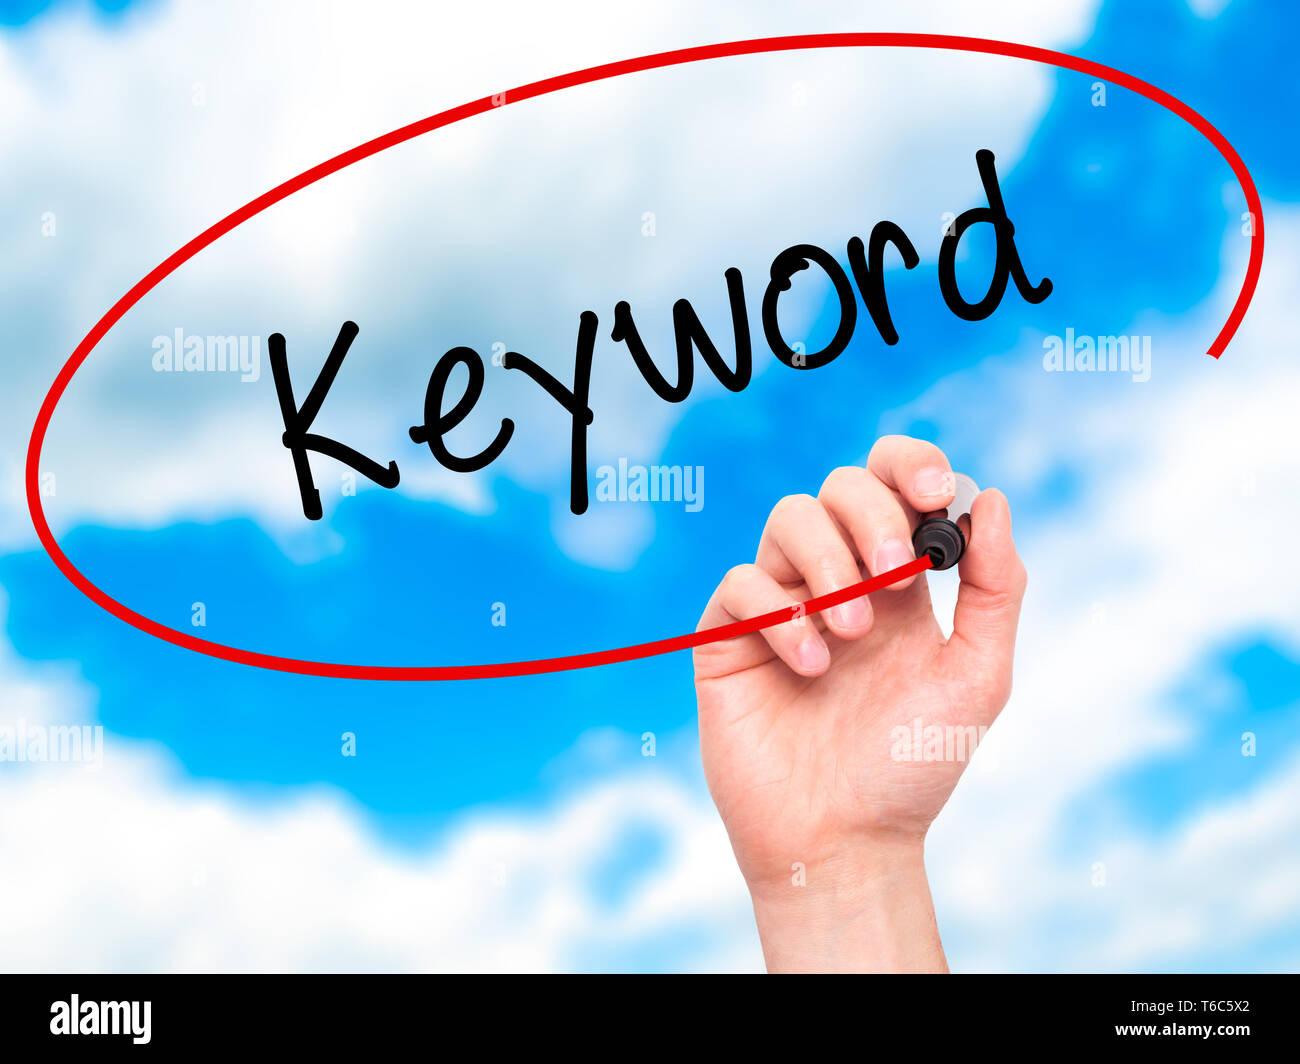 Man Hand writing Keyword with black marker on visual screen - Stock Image